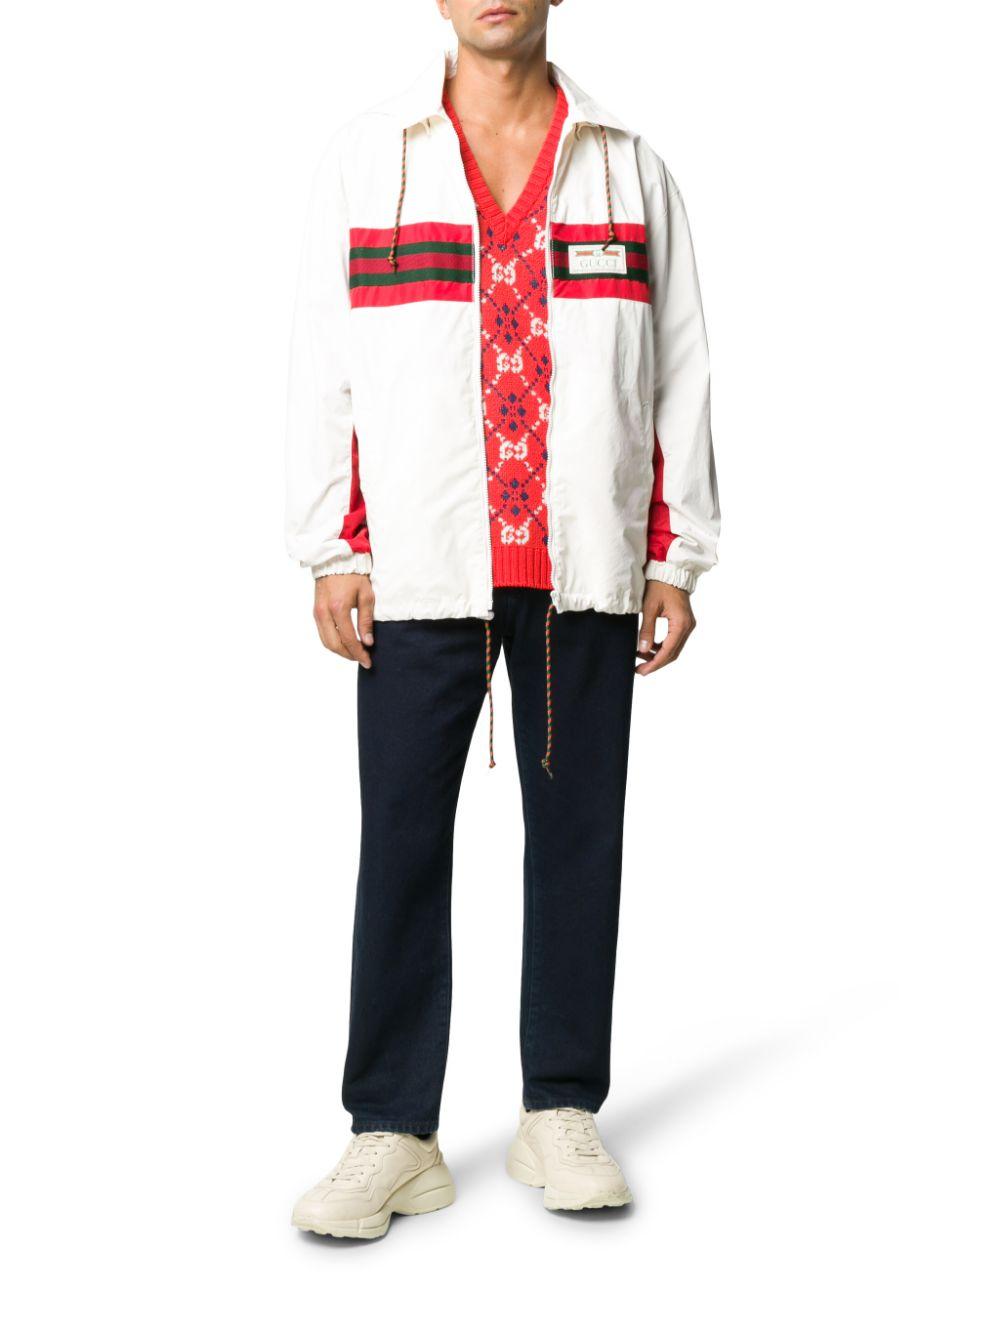 white and Gucci Web details windbraker jacket GUCCI |  | 599935-XDA0X9061